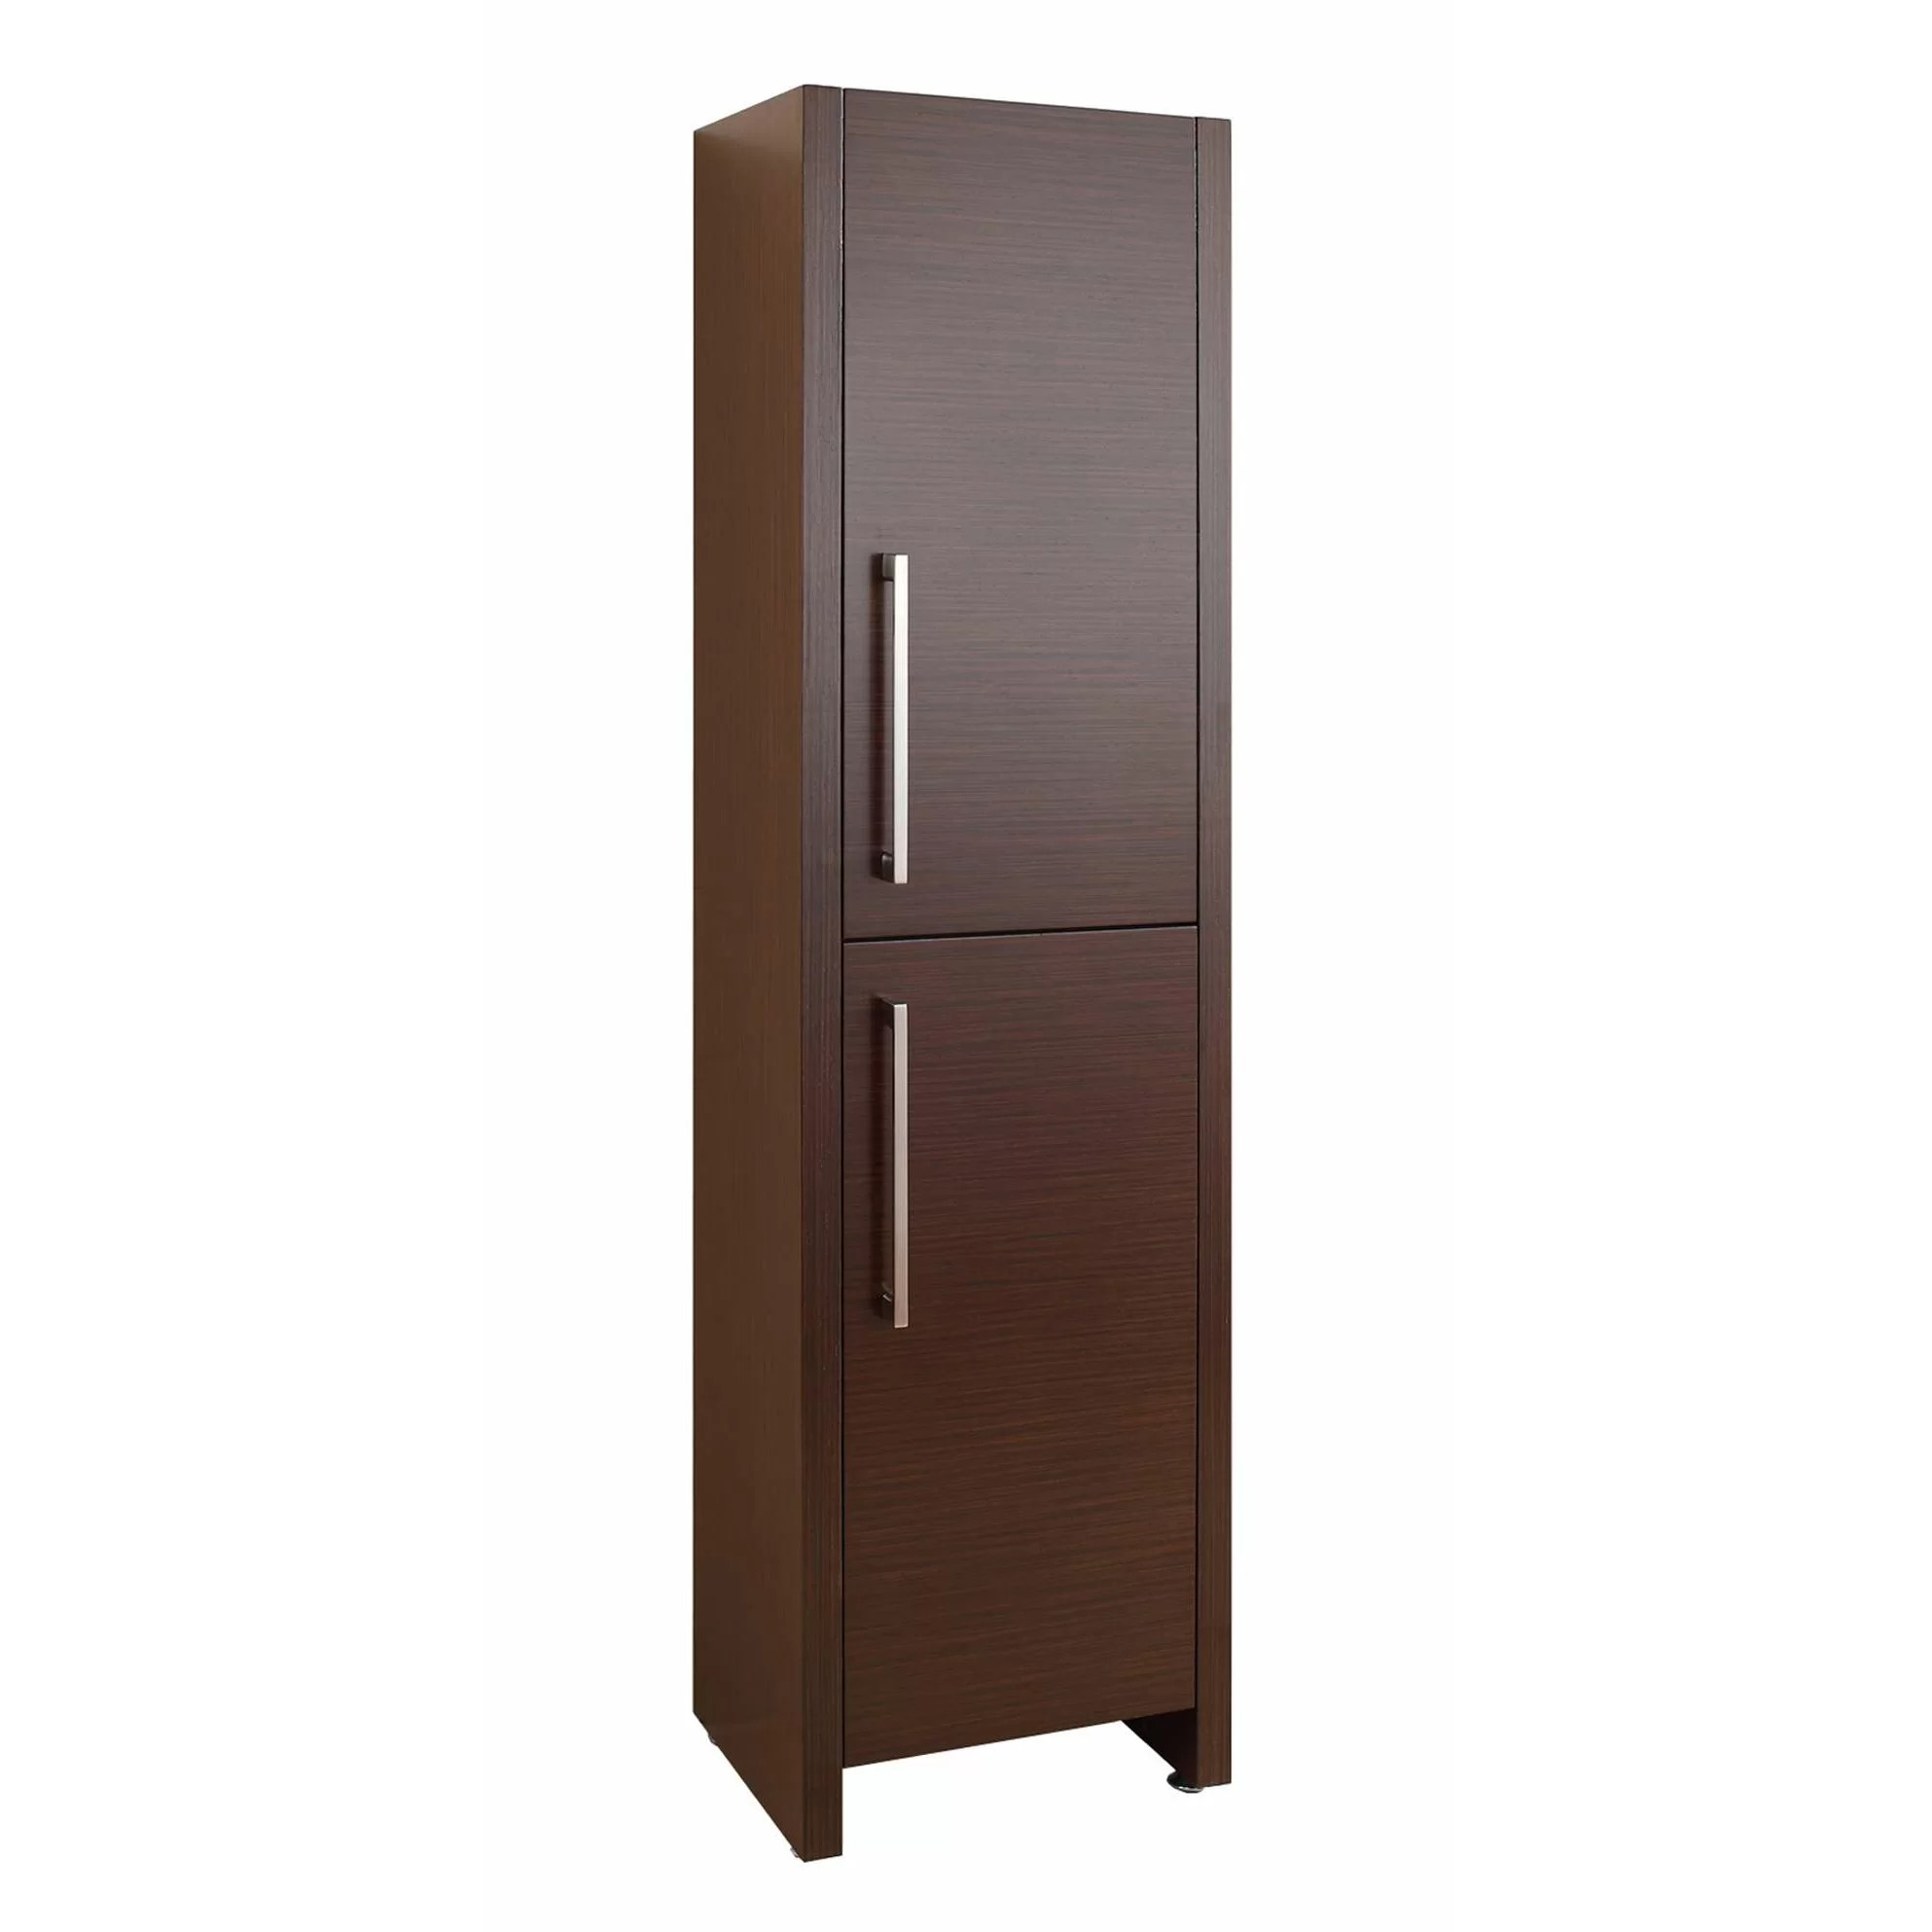 "Virtu Delano 62.2"" x 15.7"" Free Standing Linen Cabinet"